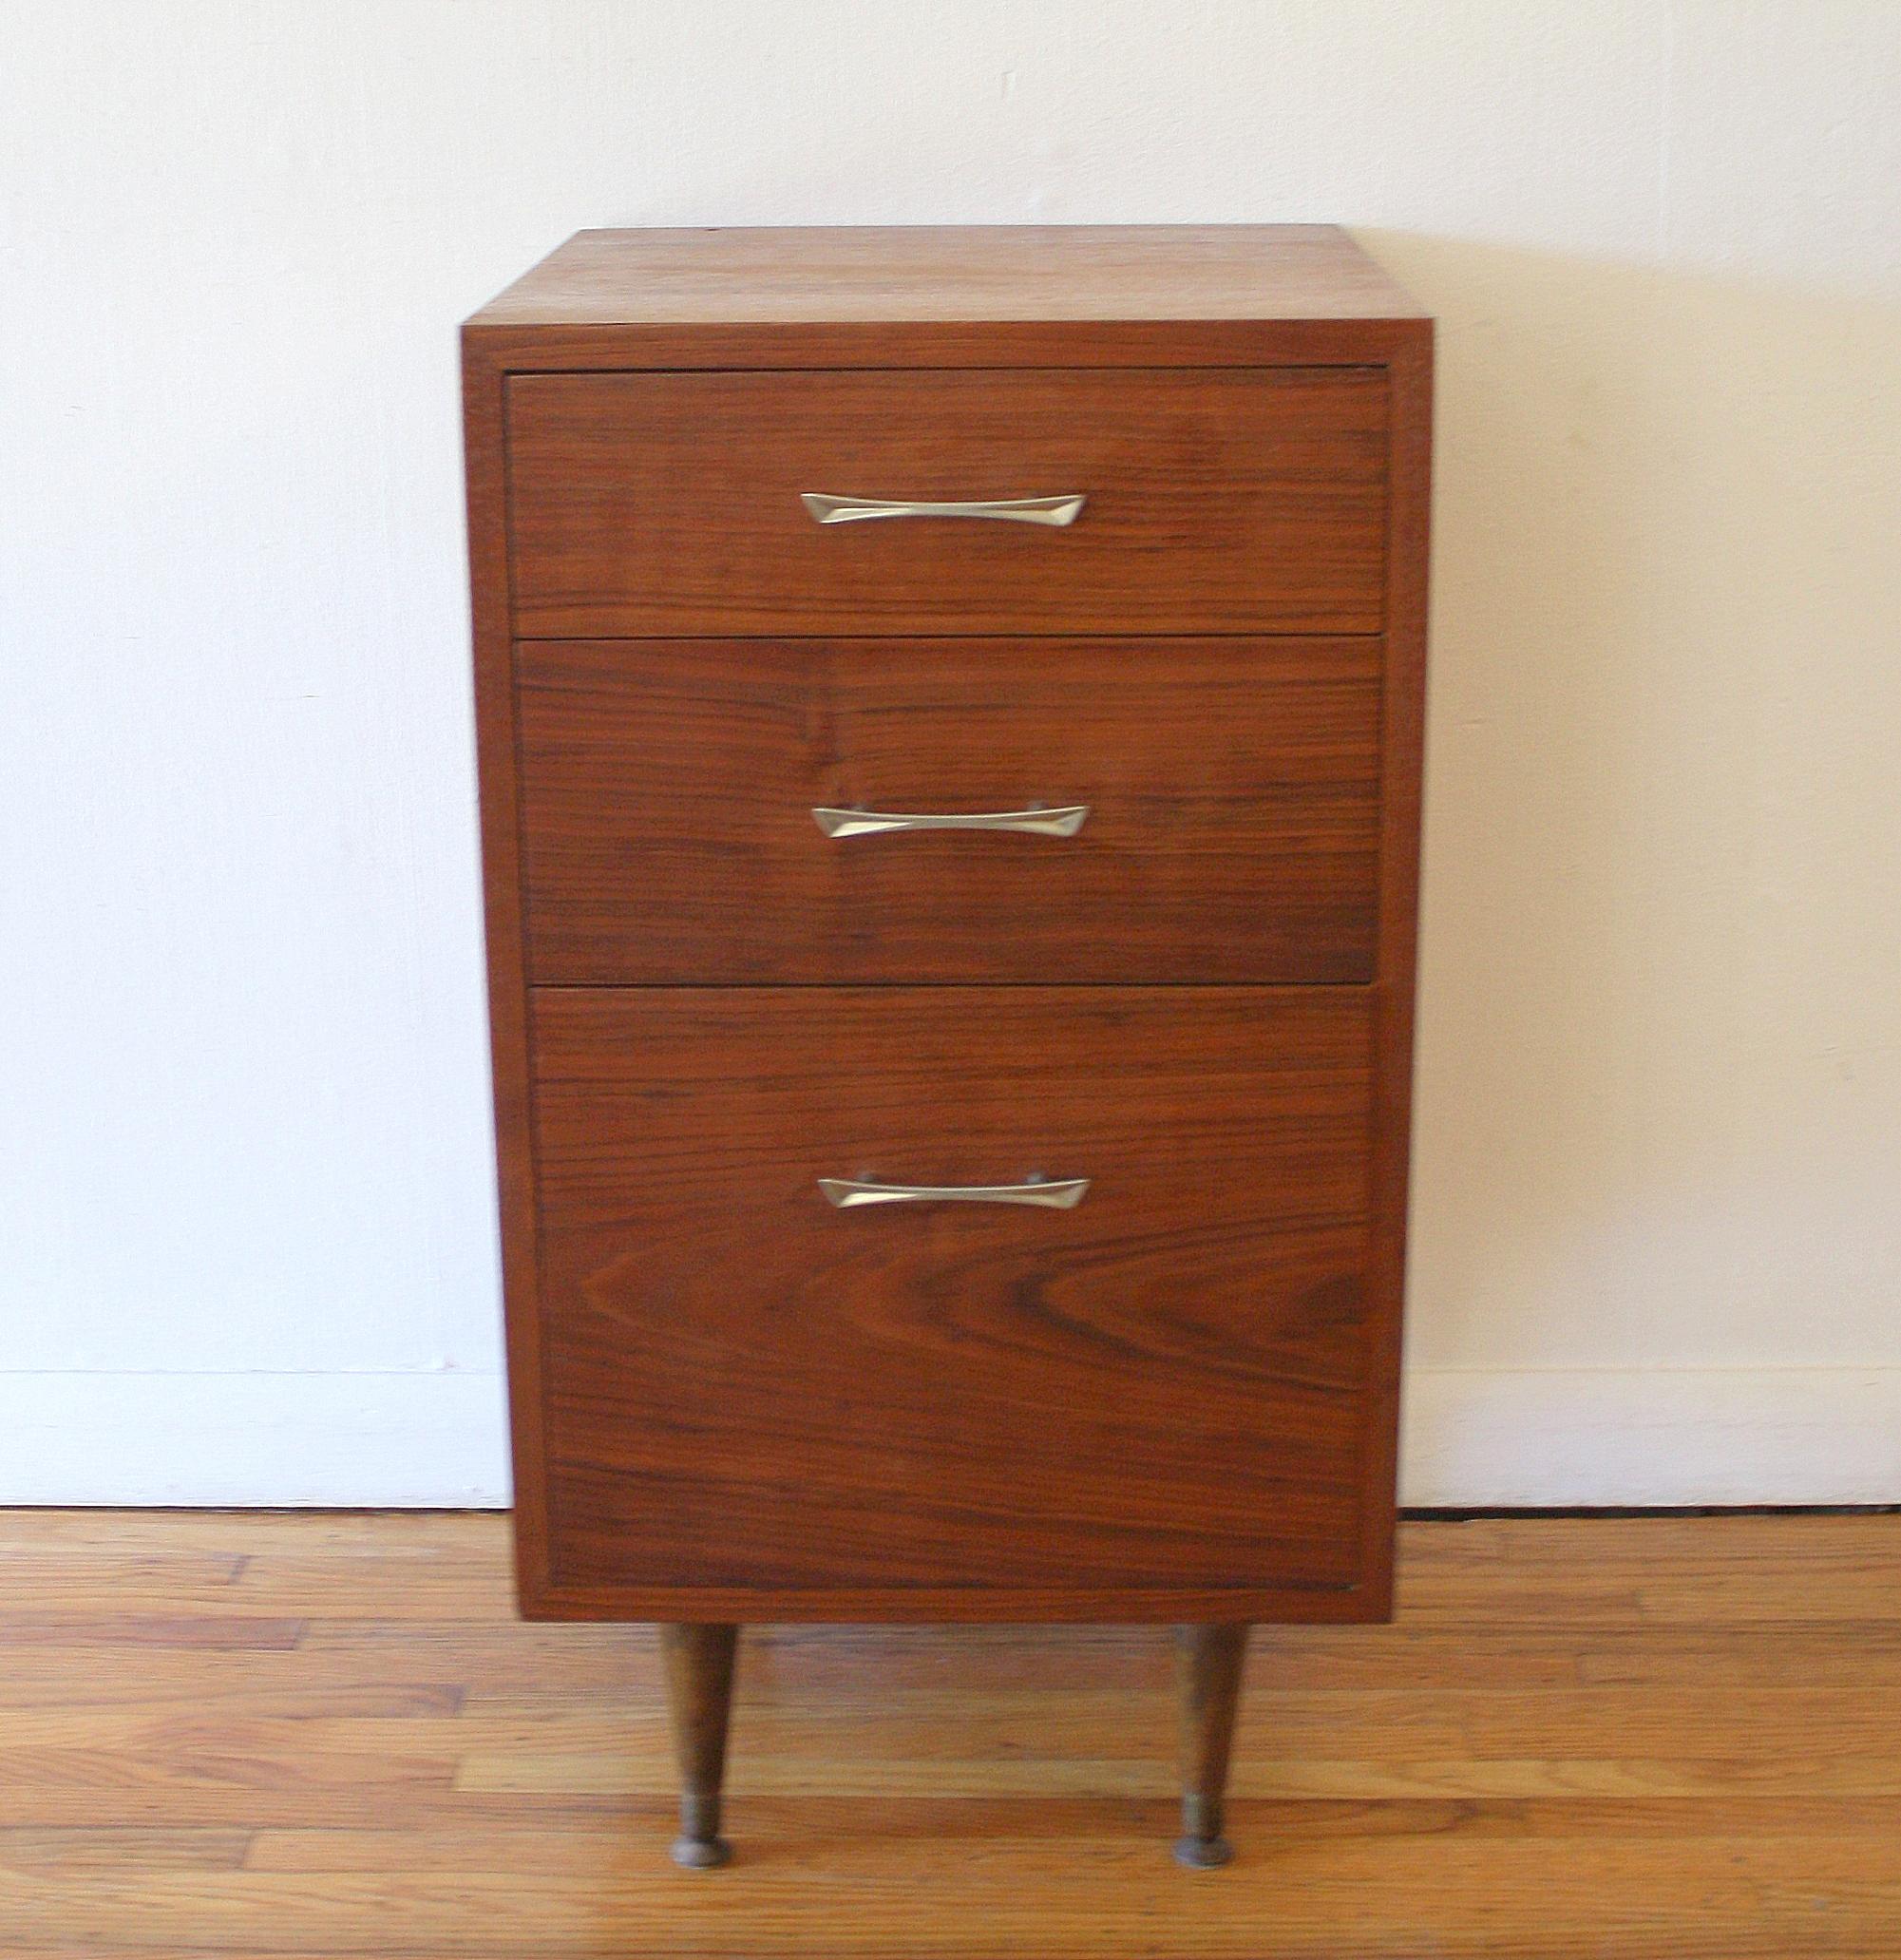 mcm filing cabinet 1.JPG